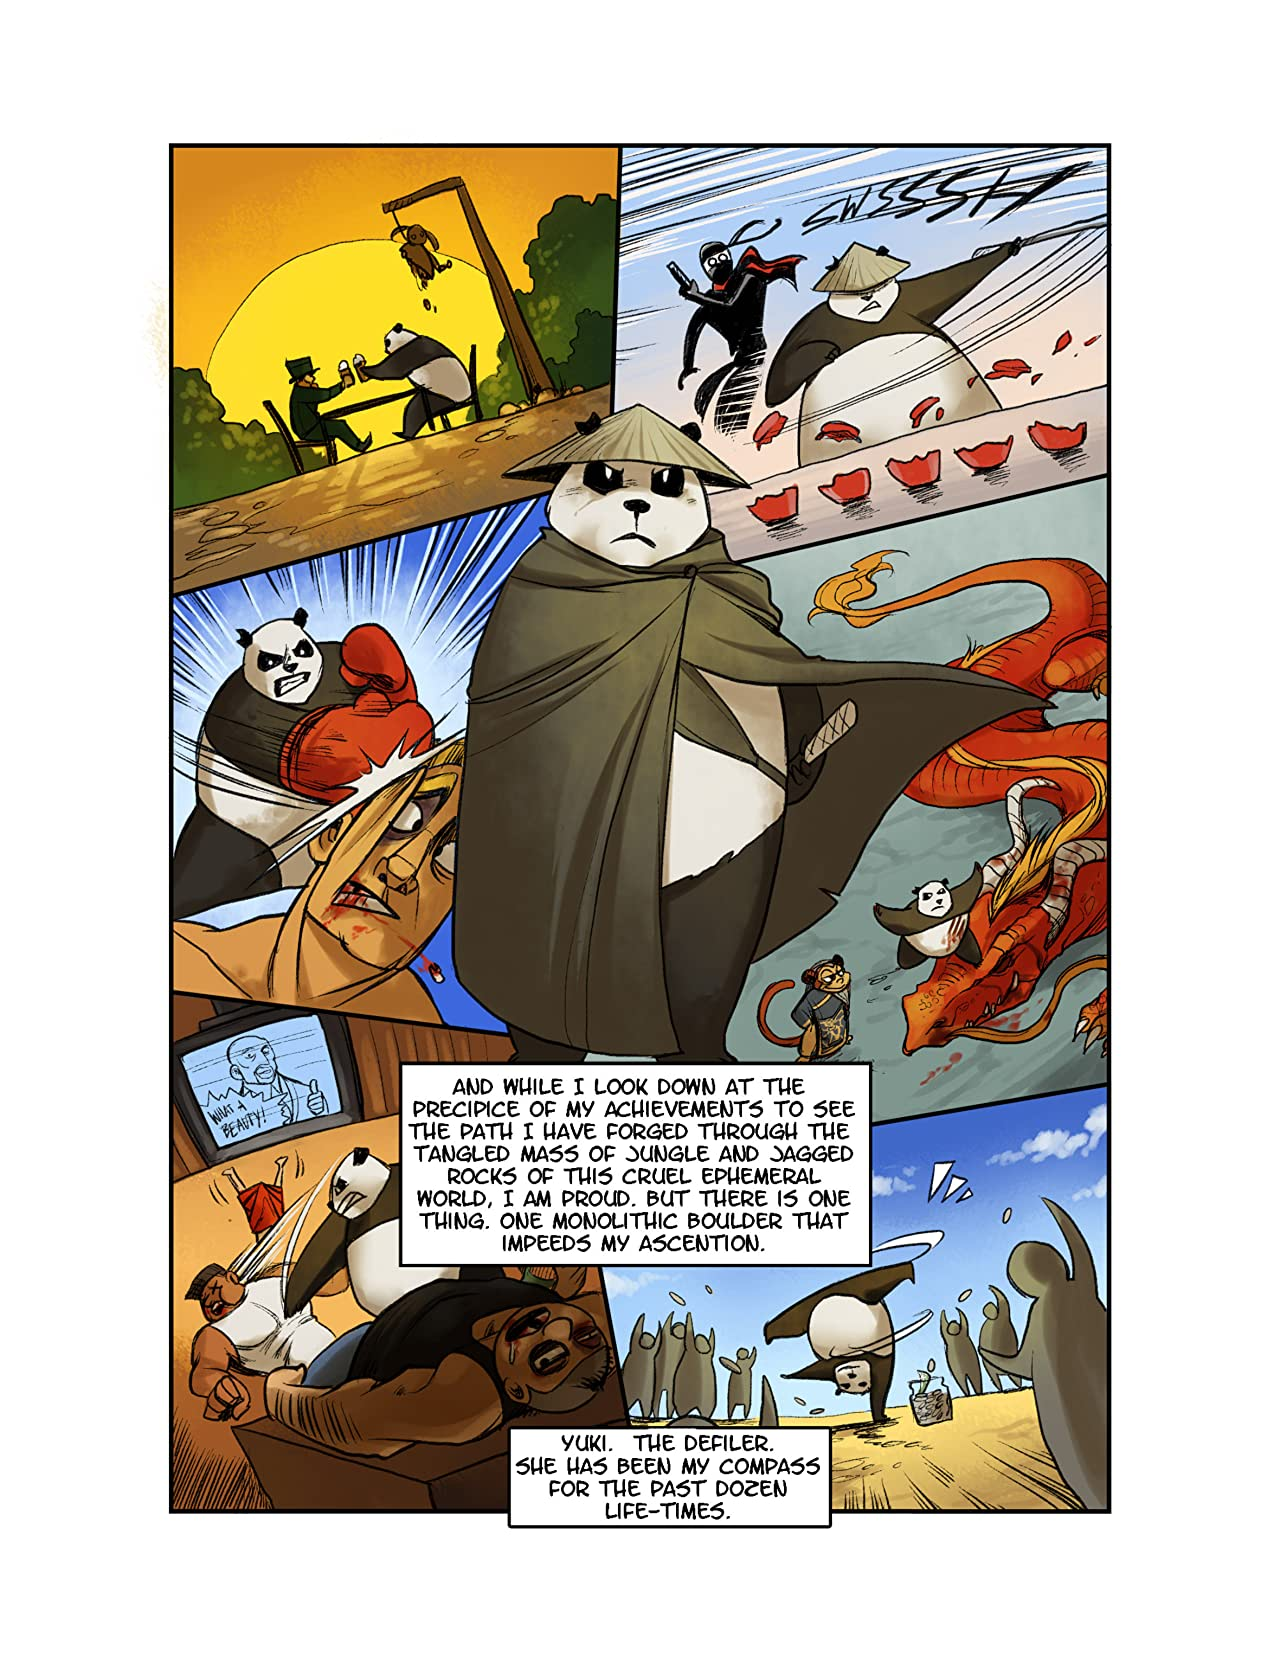 Yuki vs Panda Vol. 2: The Confrontation!